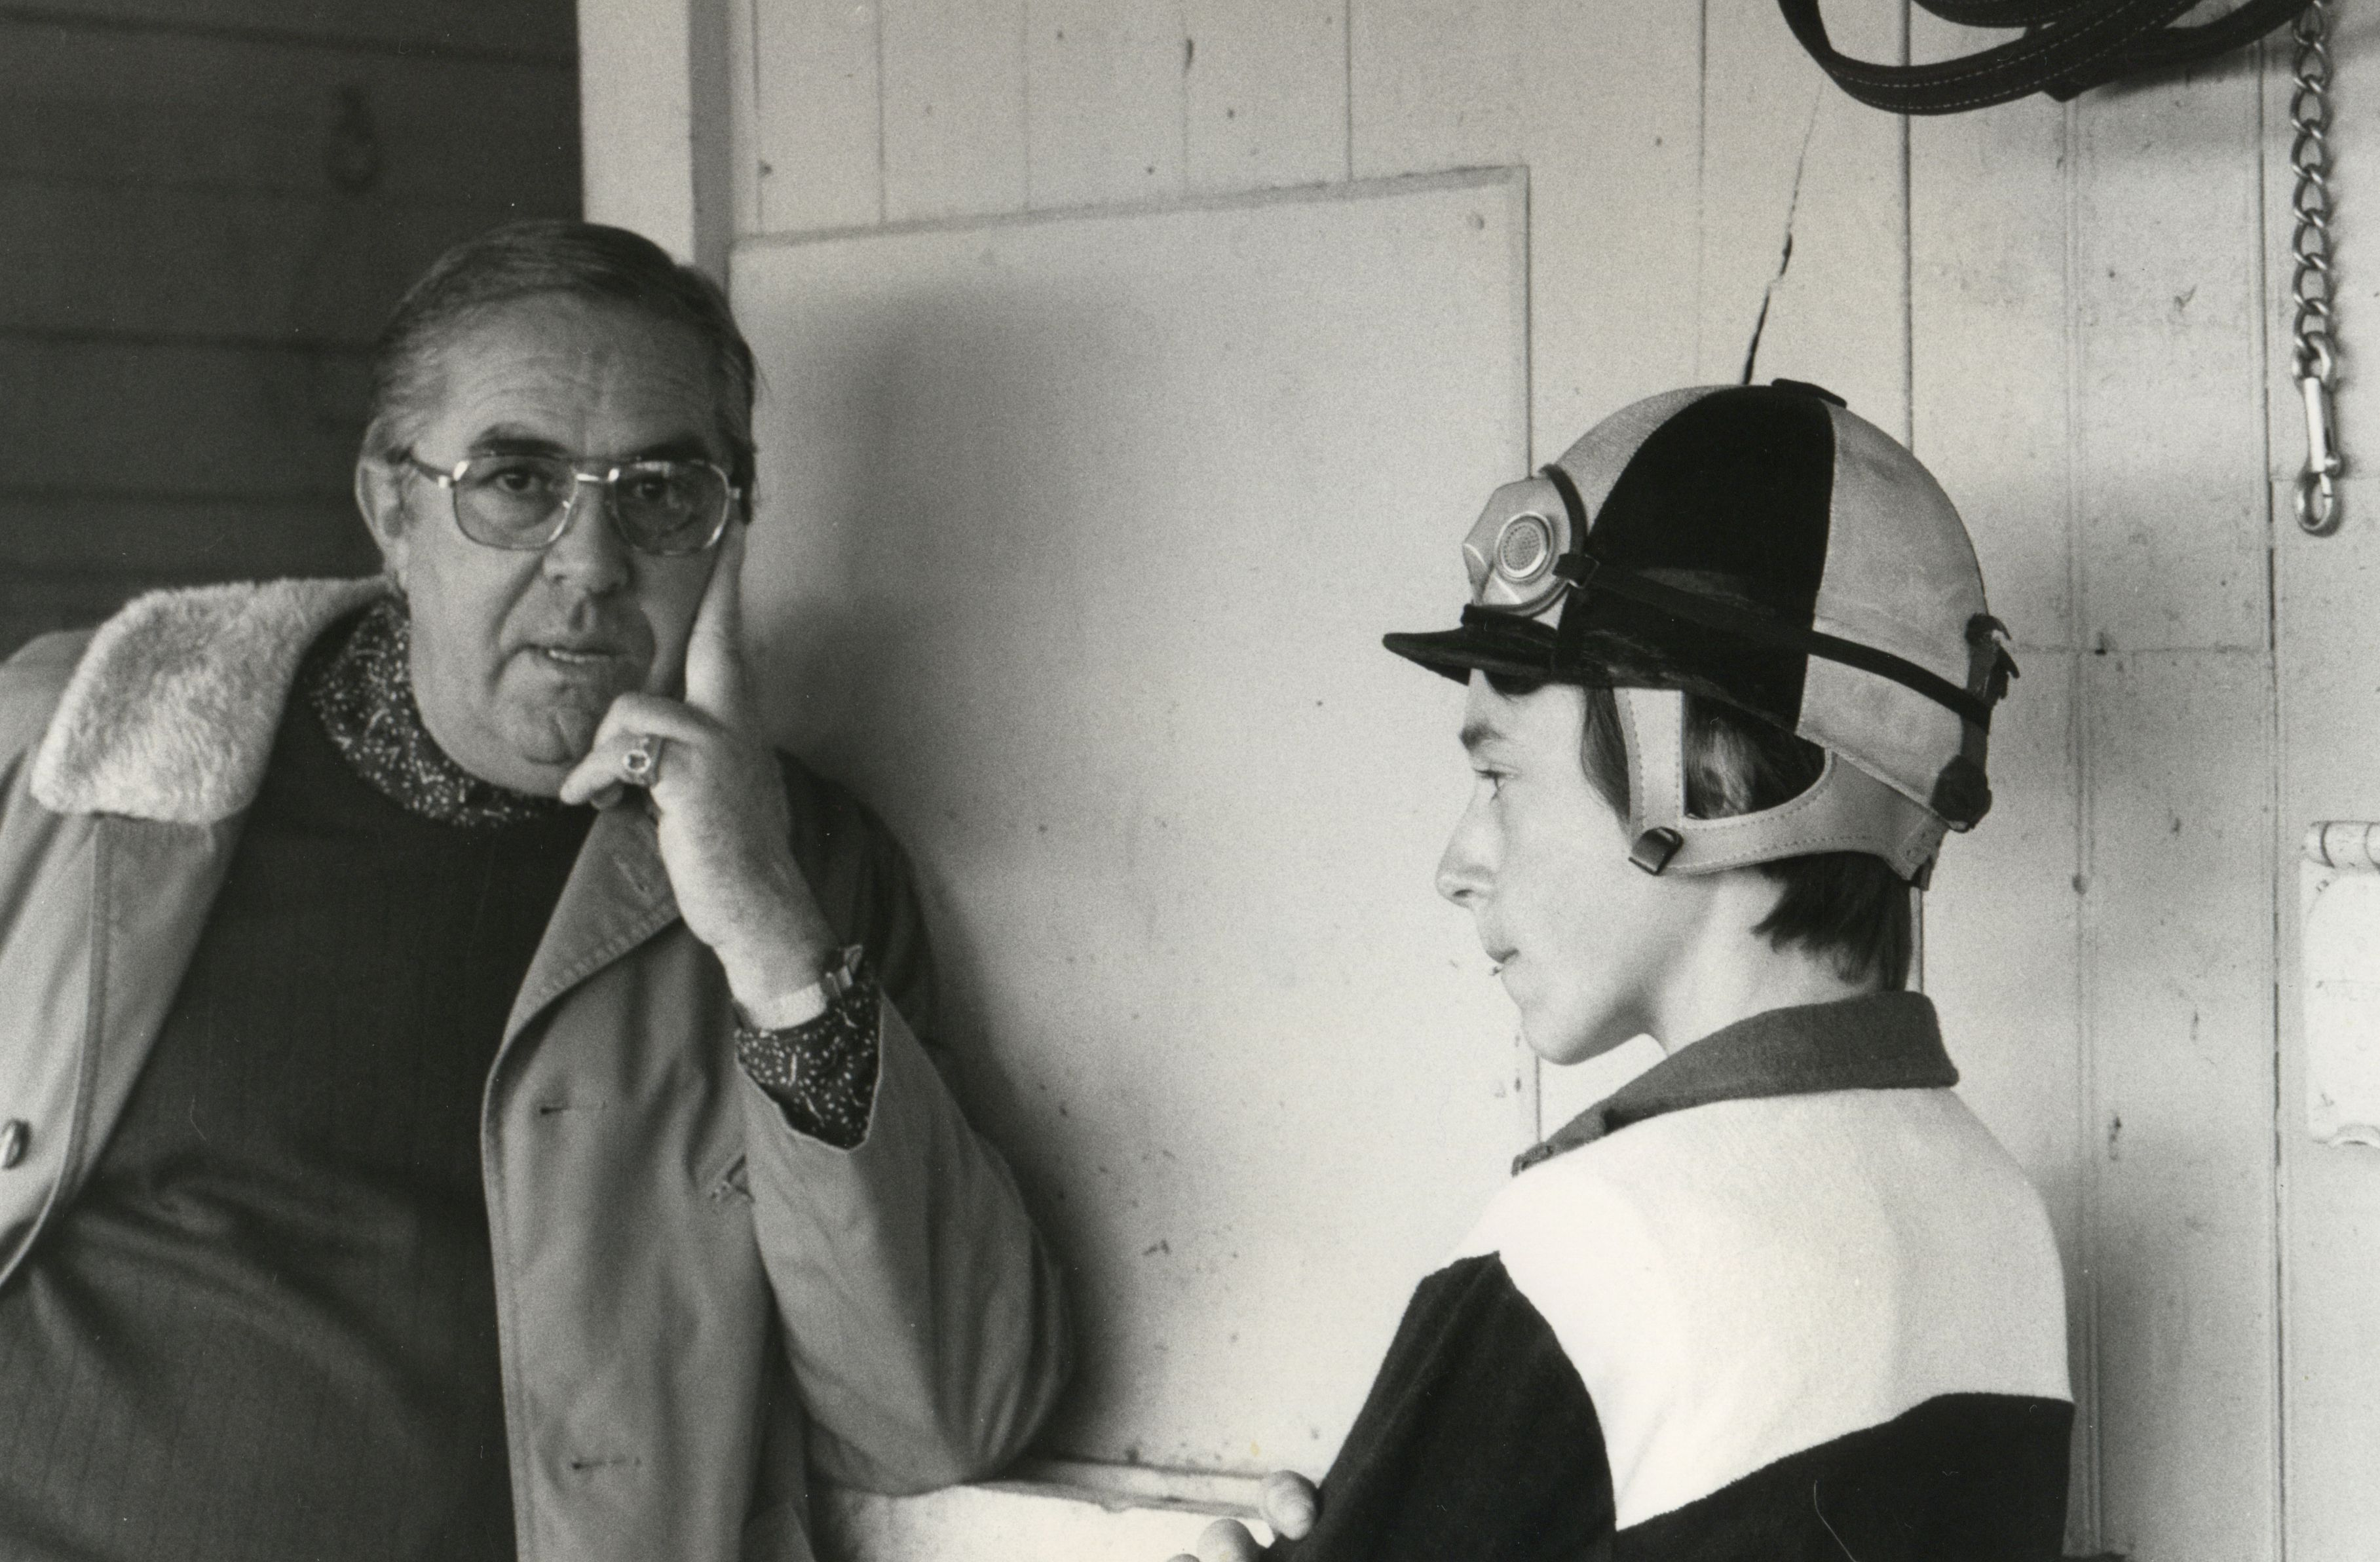 Laz Barrera and jockey Steve Cauthen (NYRA/Photo Communications /Museum Collection)